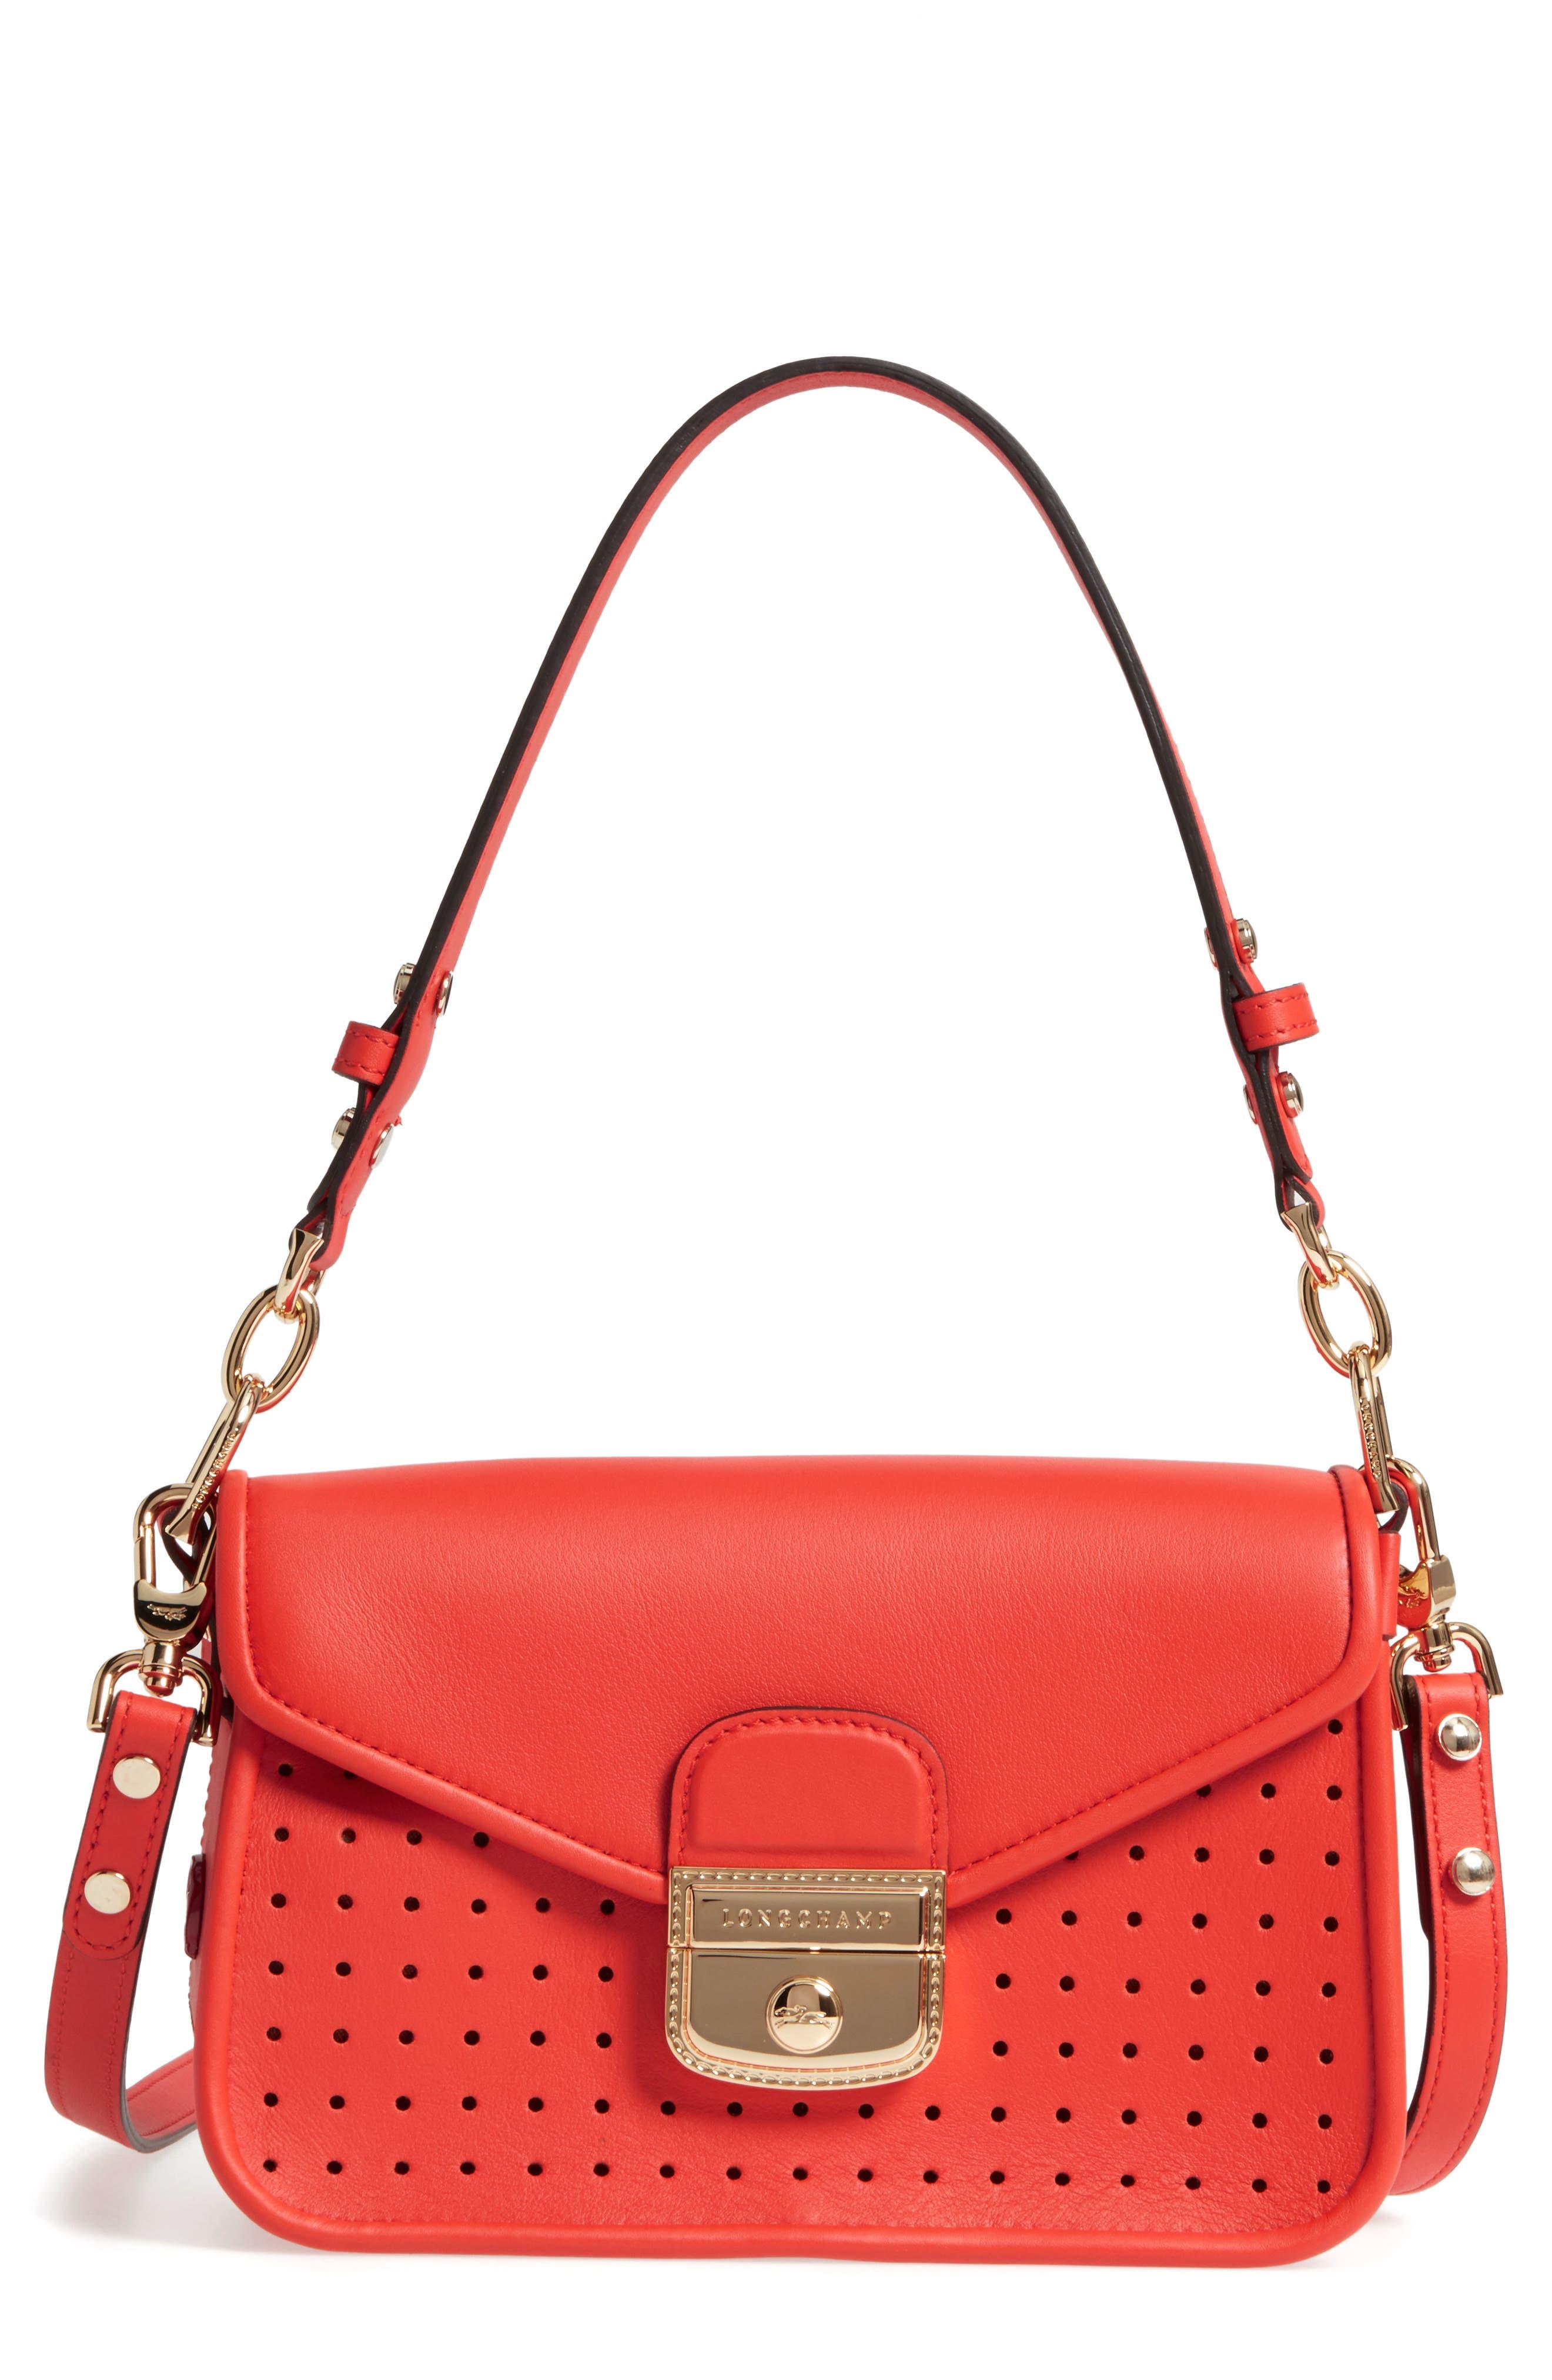 Longchamp Small Mademoiselle Calfskin Leather Crossbody Bag